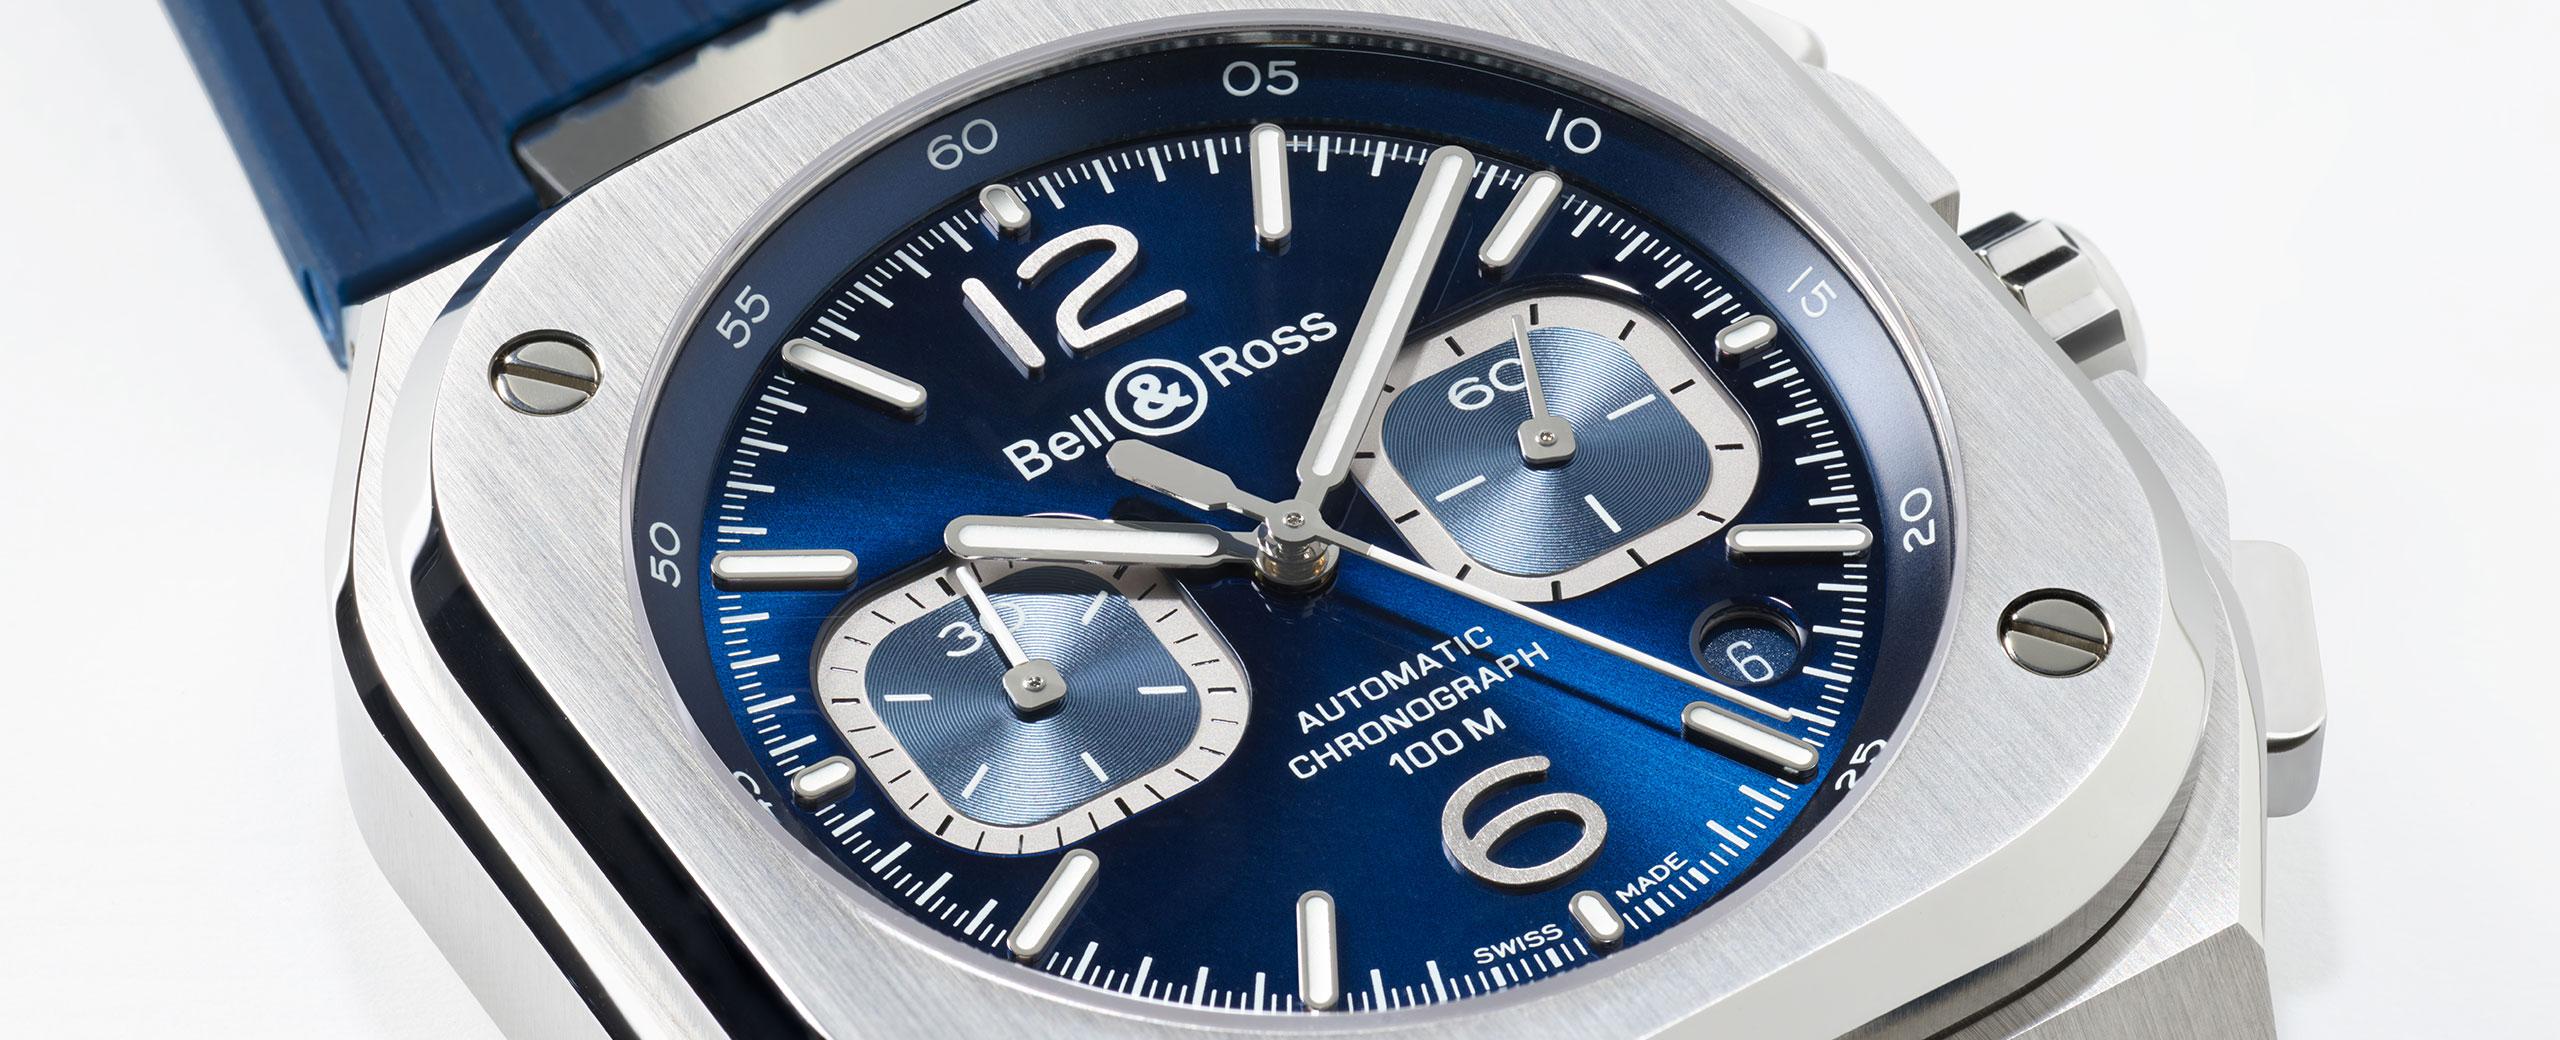 BR 05 CHRONO BLUE STEEL